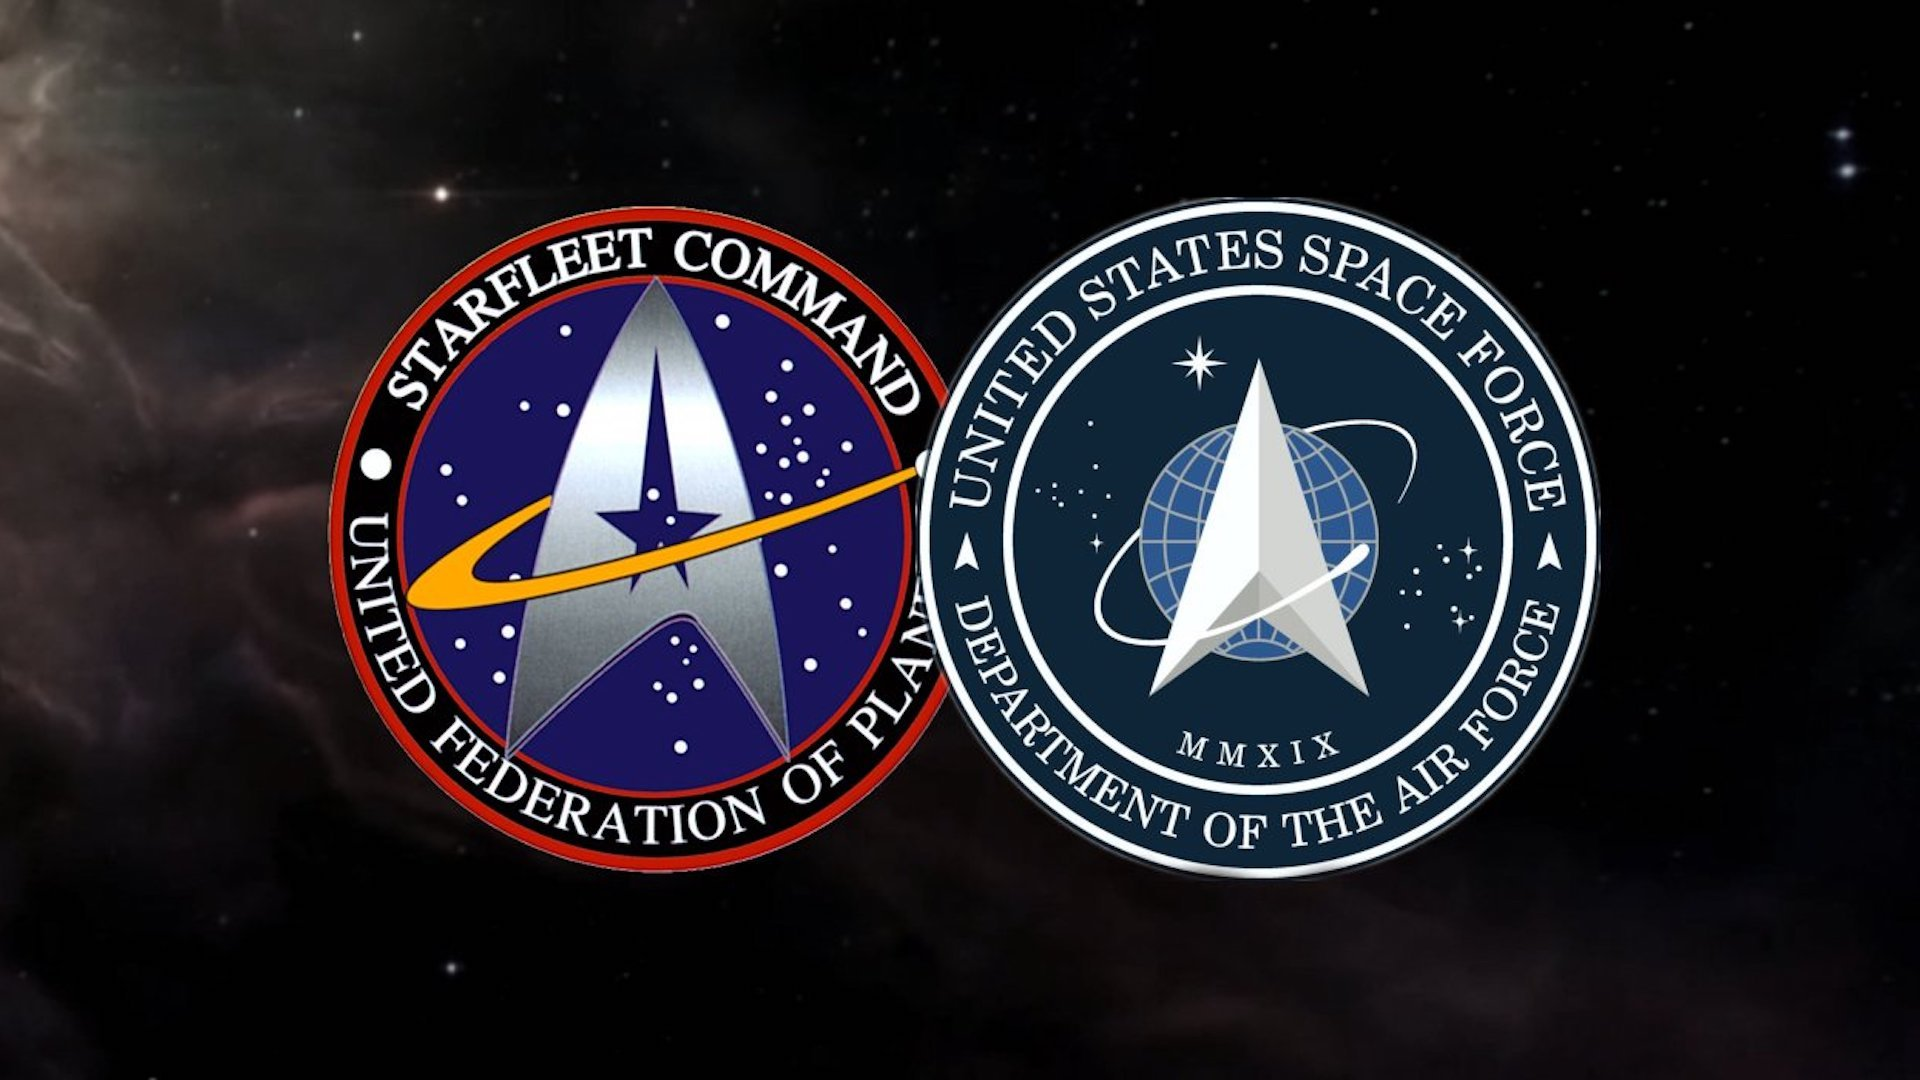 El logo de la Fuerza Espacial de Donald Trump es igual al de Star Trek